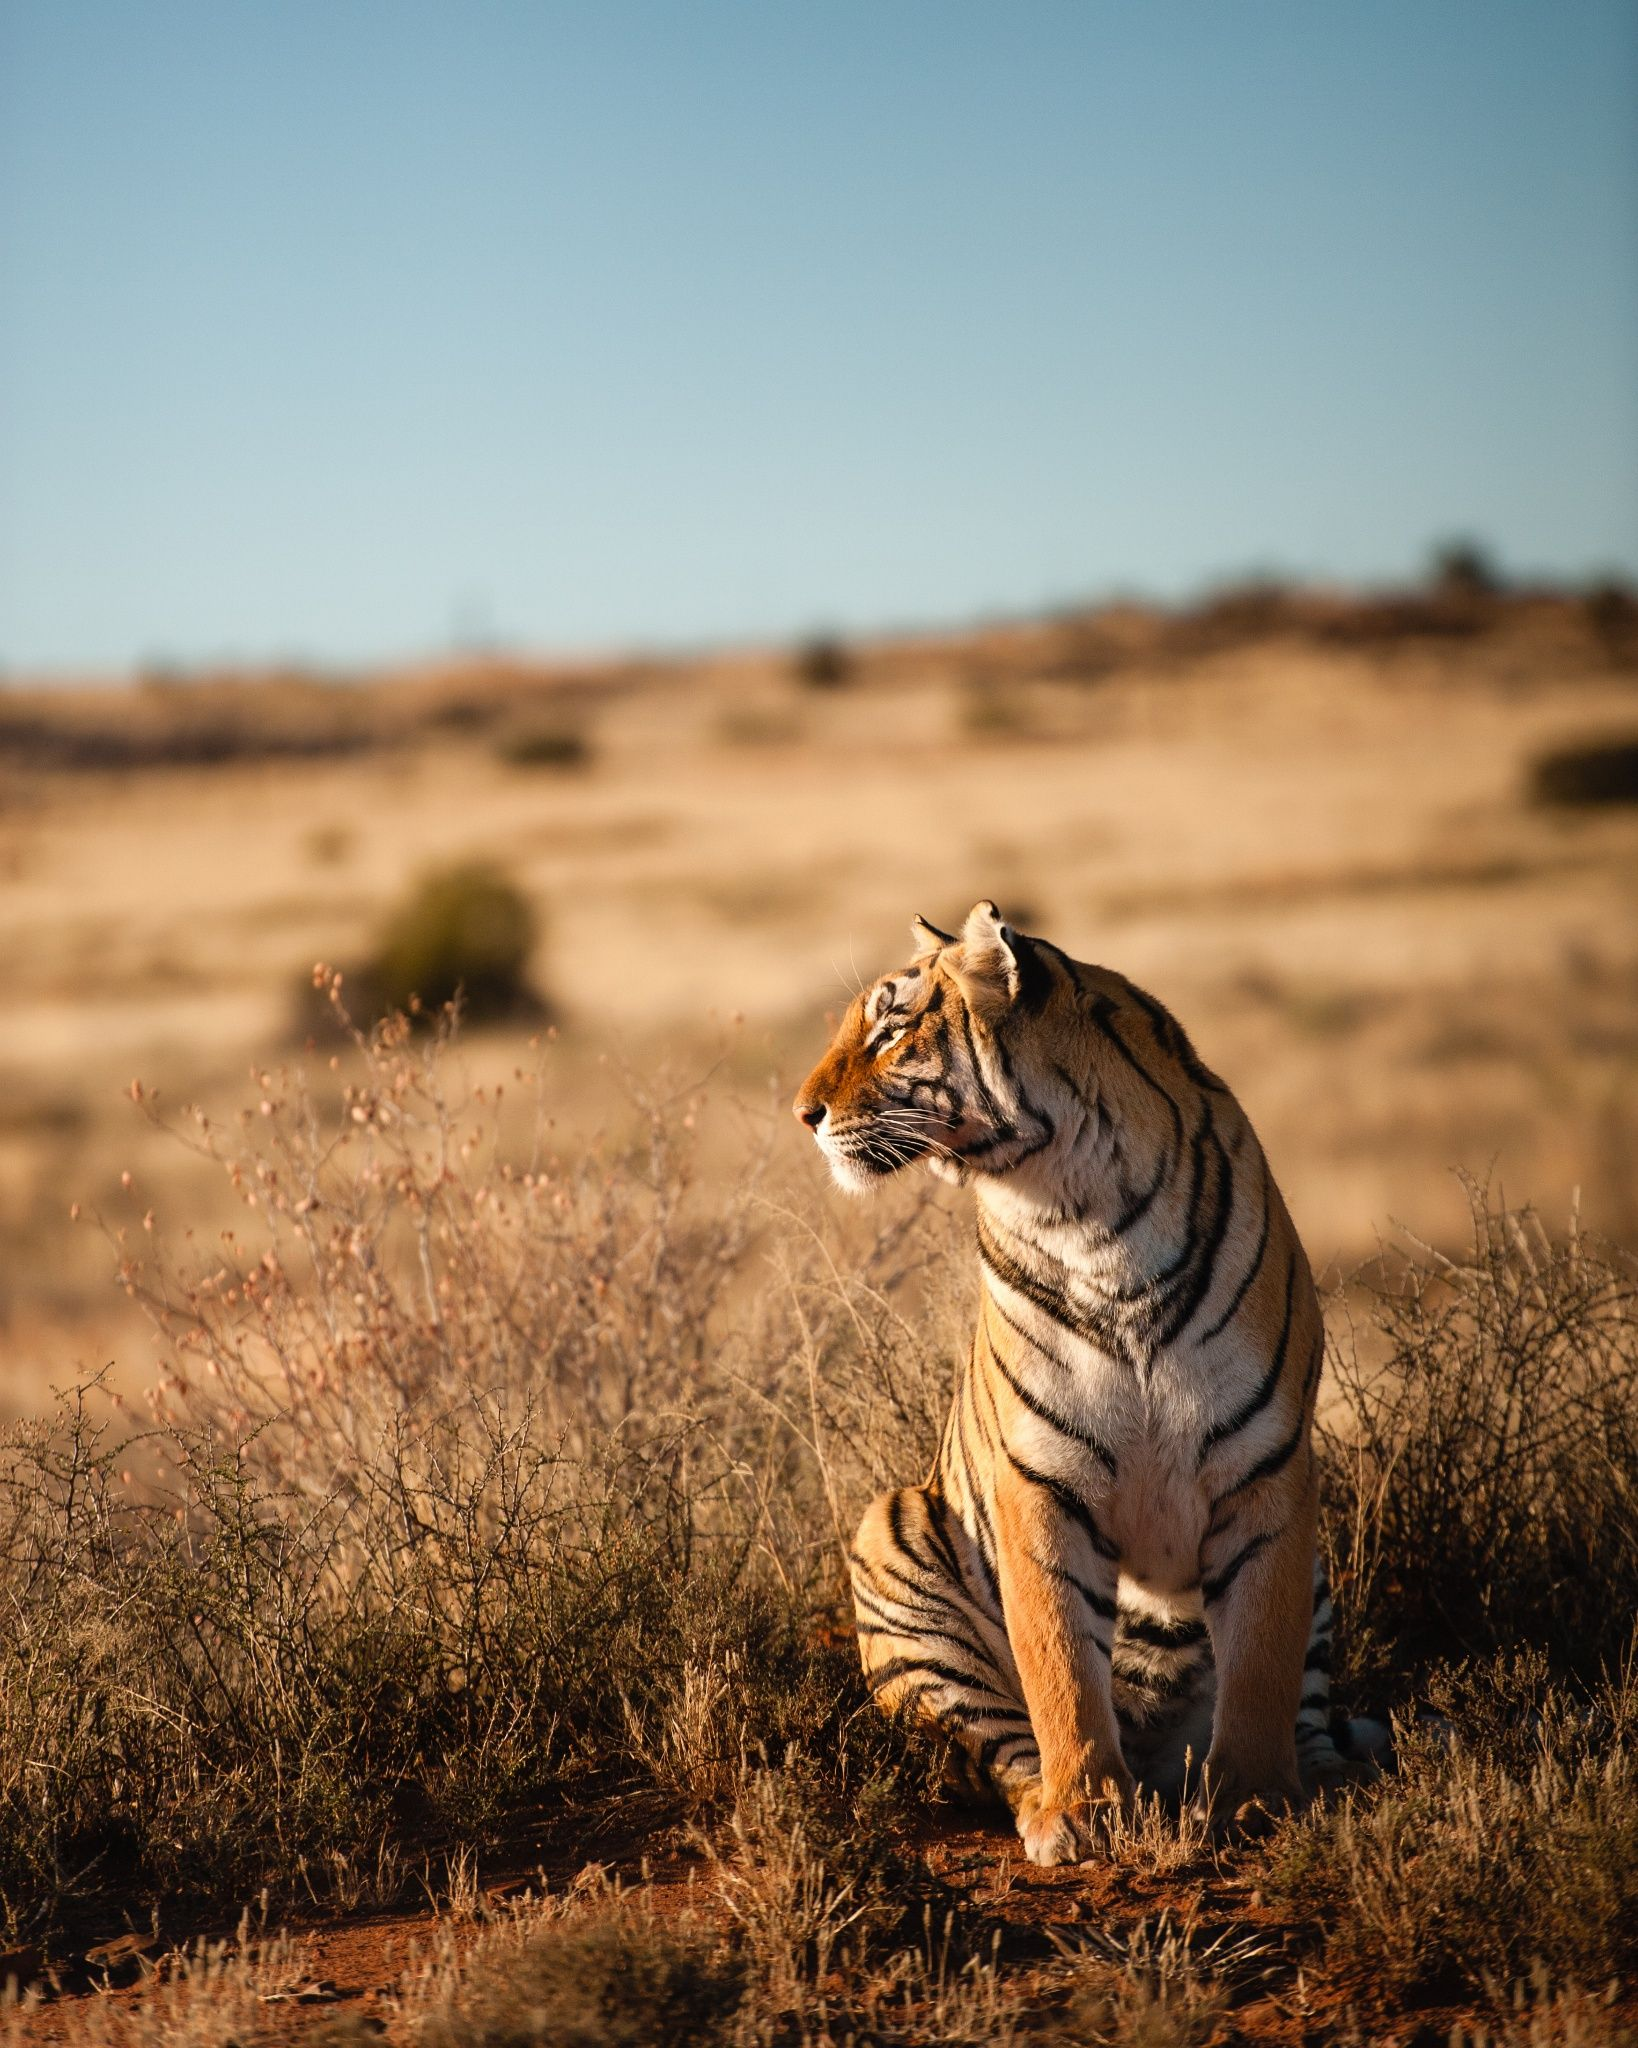 Tigerleopard 4 By Shrivant Rajgarhia On 500px